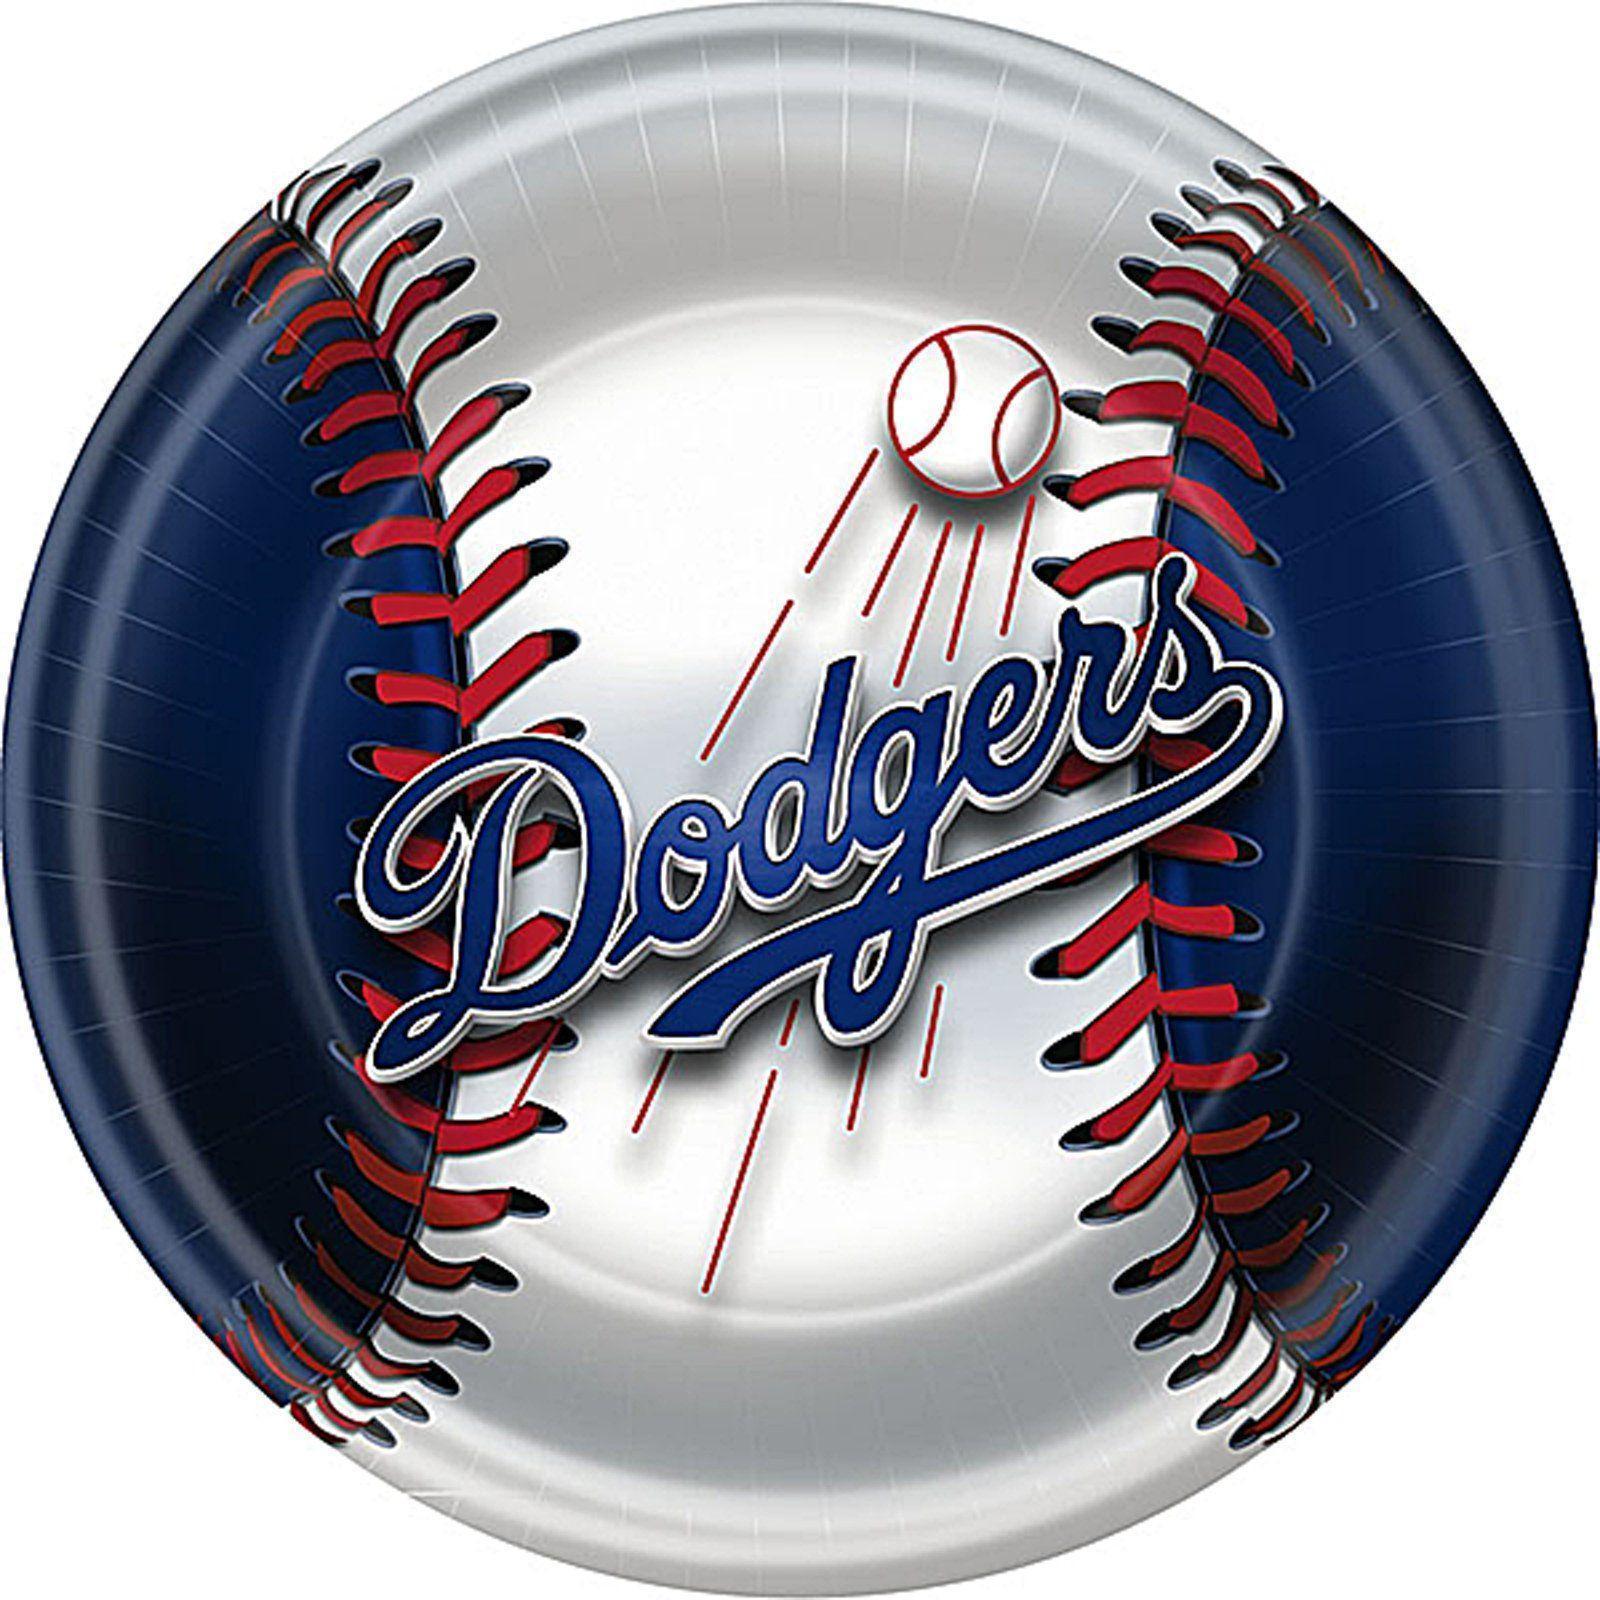 Los Angeles Dodgers Baseball Wallpapers - Wallpaper Cave  Dodgers Baseball